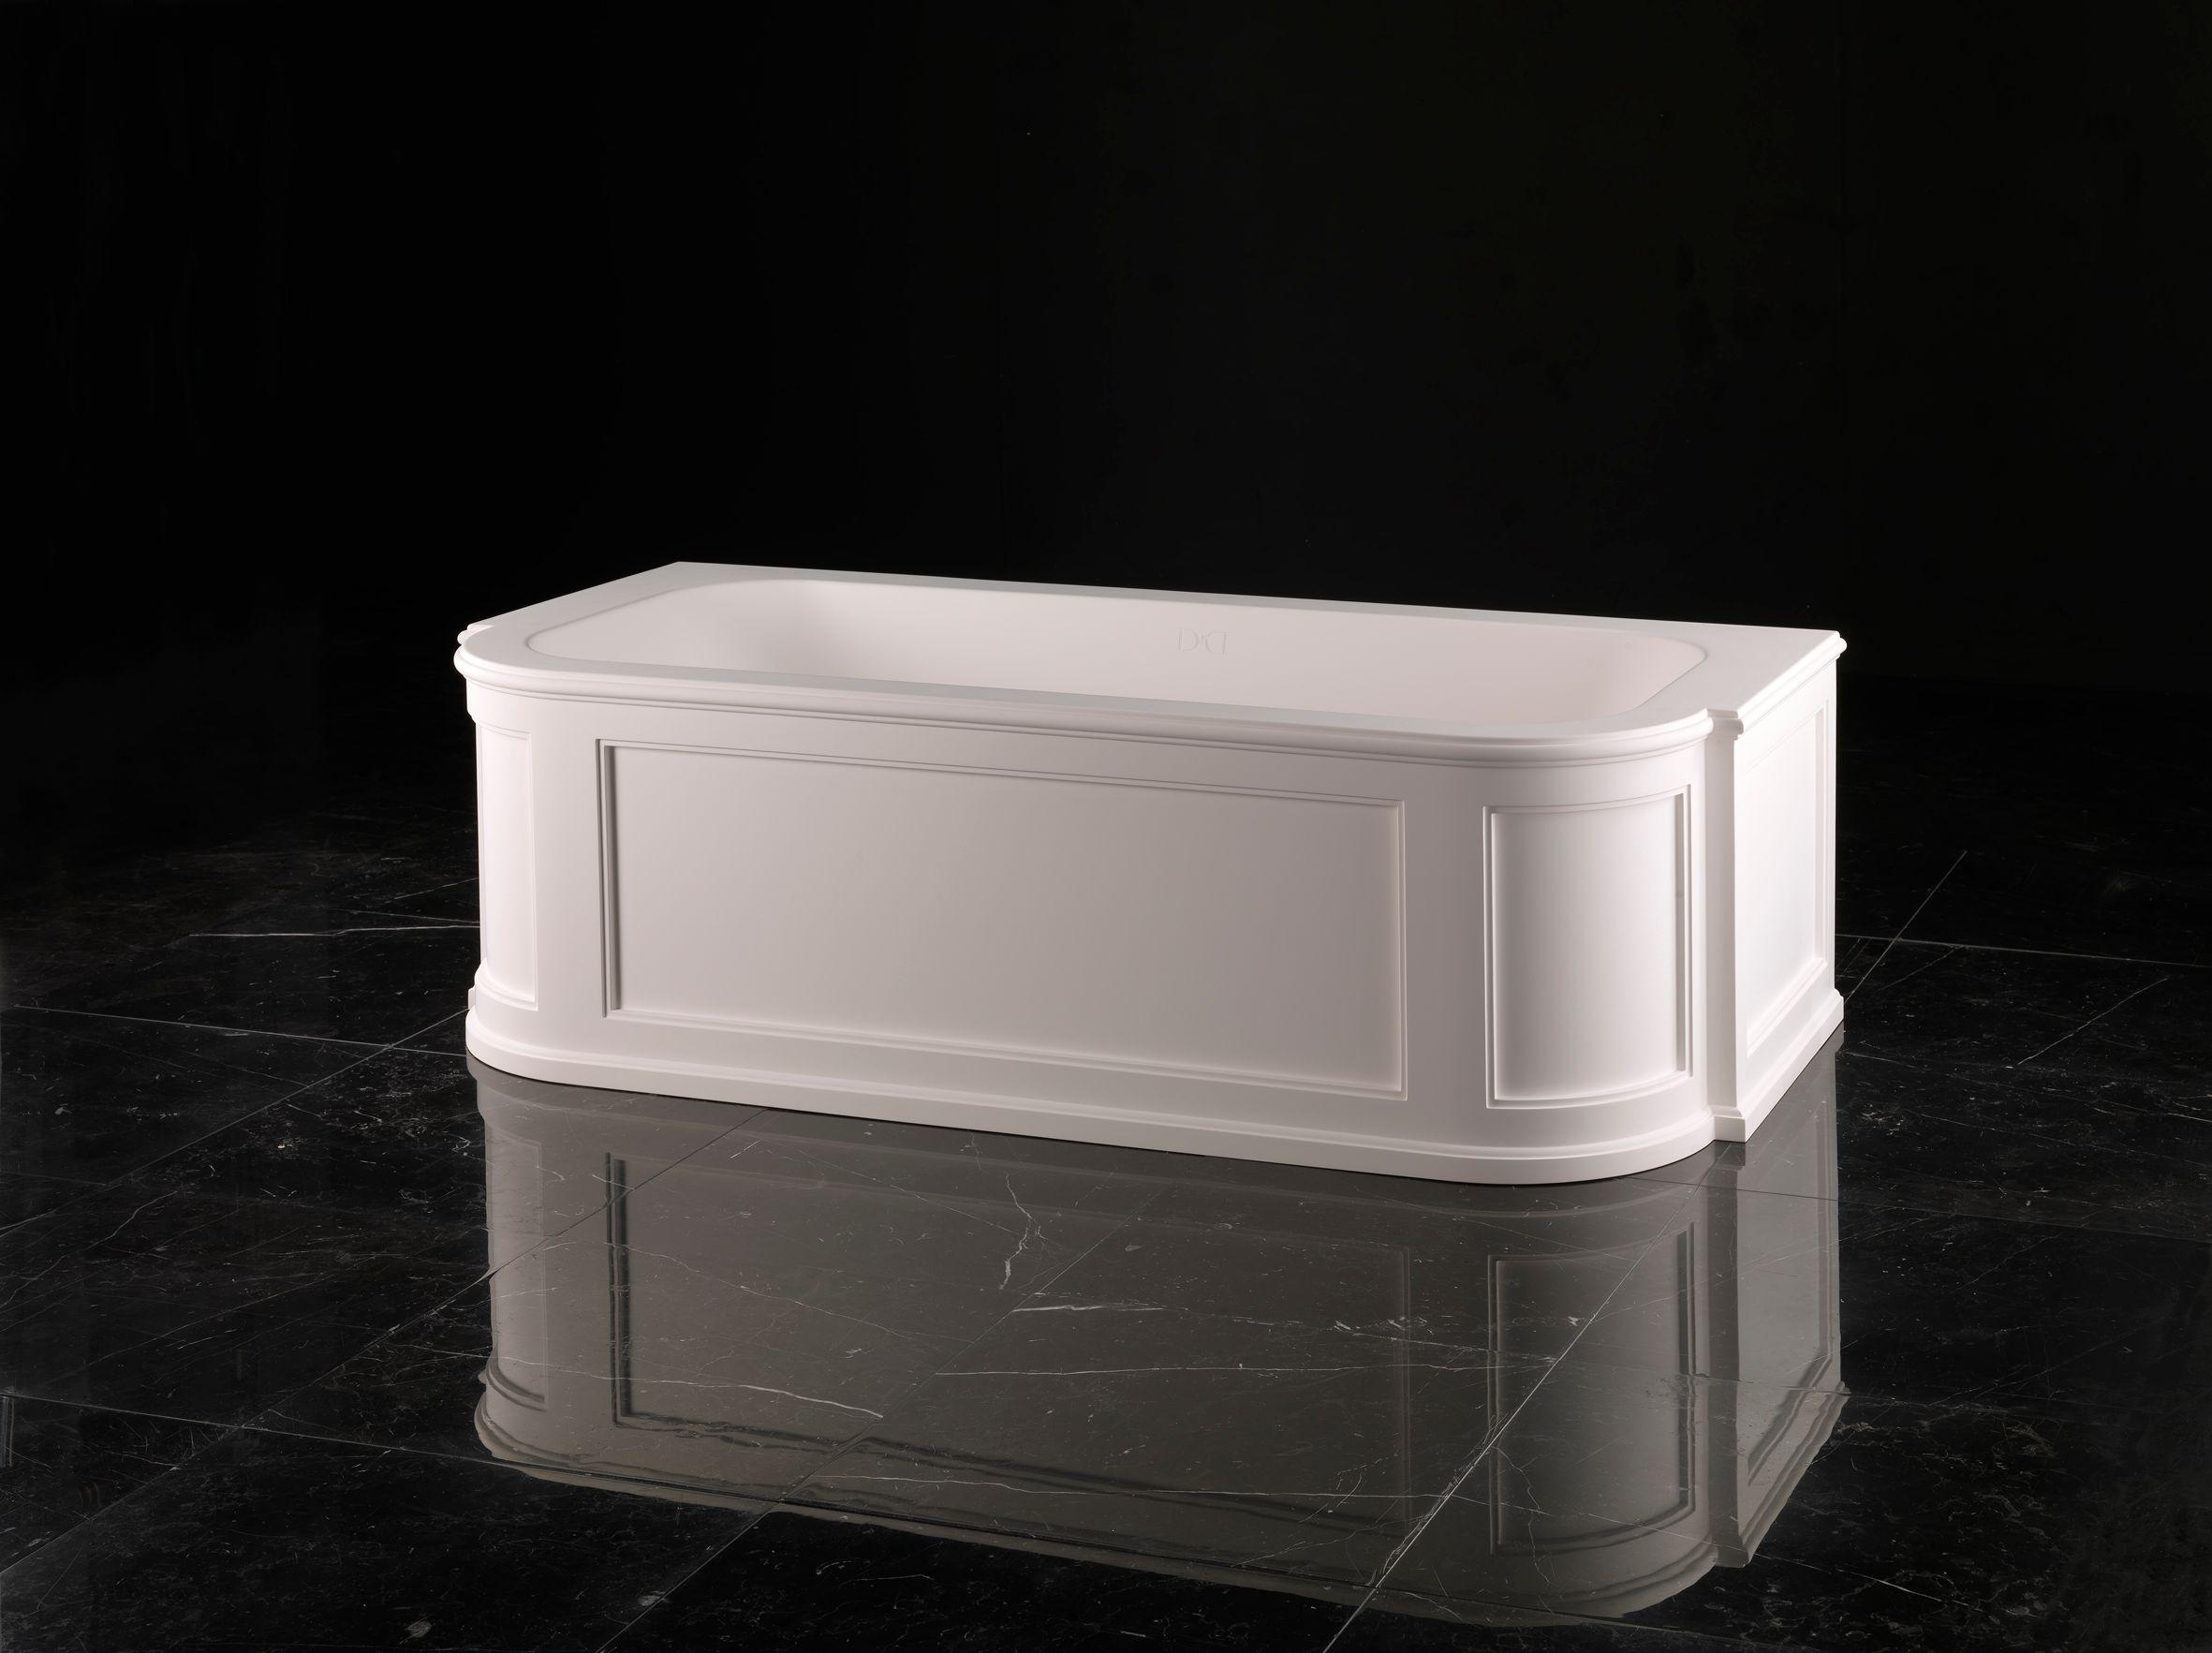 neoclassical style bathtub president by devon devon. Black Bedroom Furniture Sets. Home Design Ideas